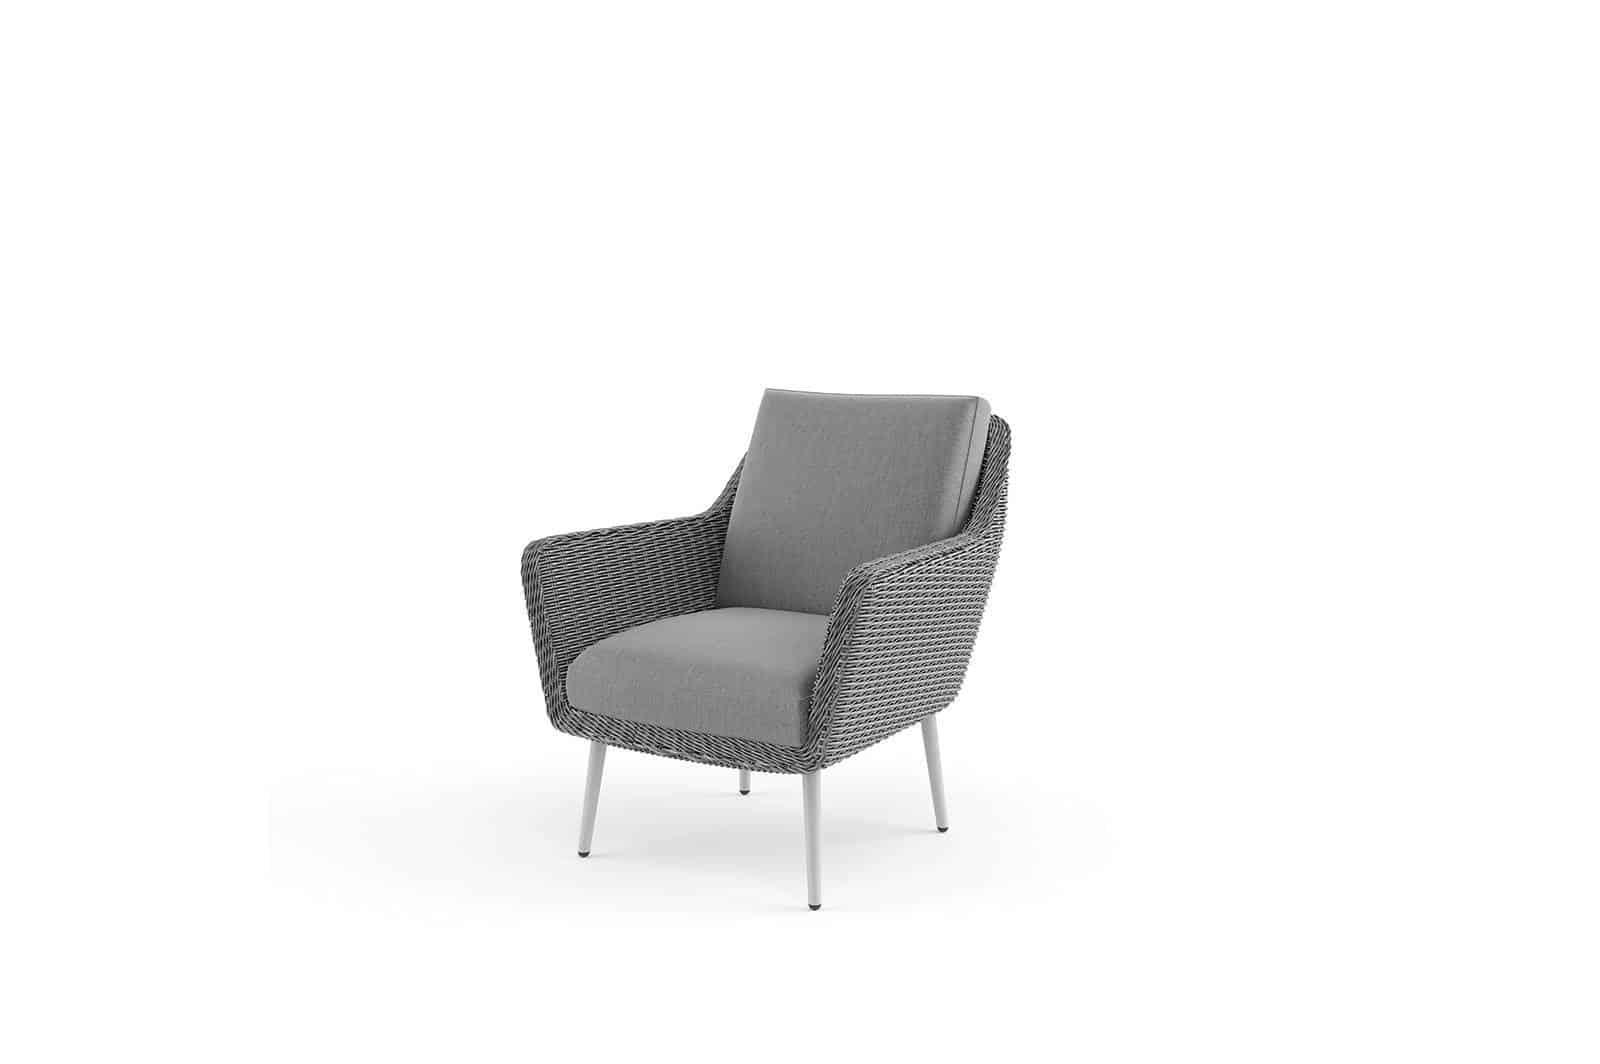 Meble ogrodowe MONZA royal grey